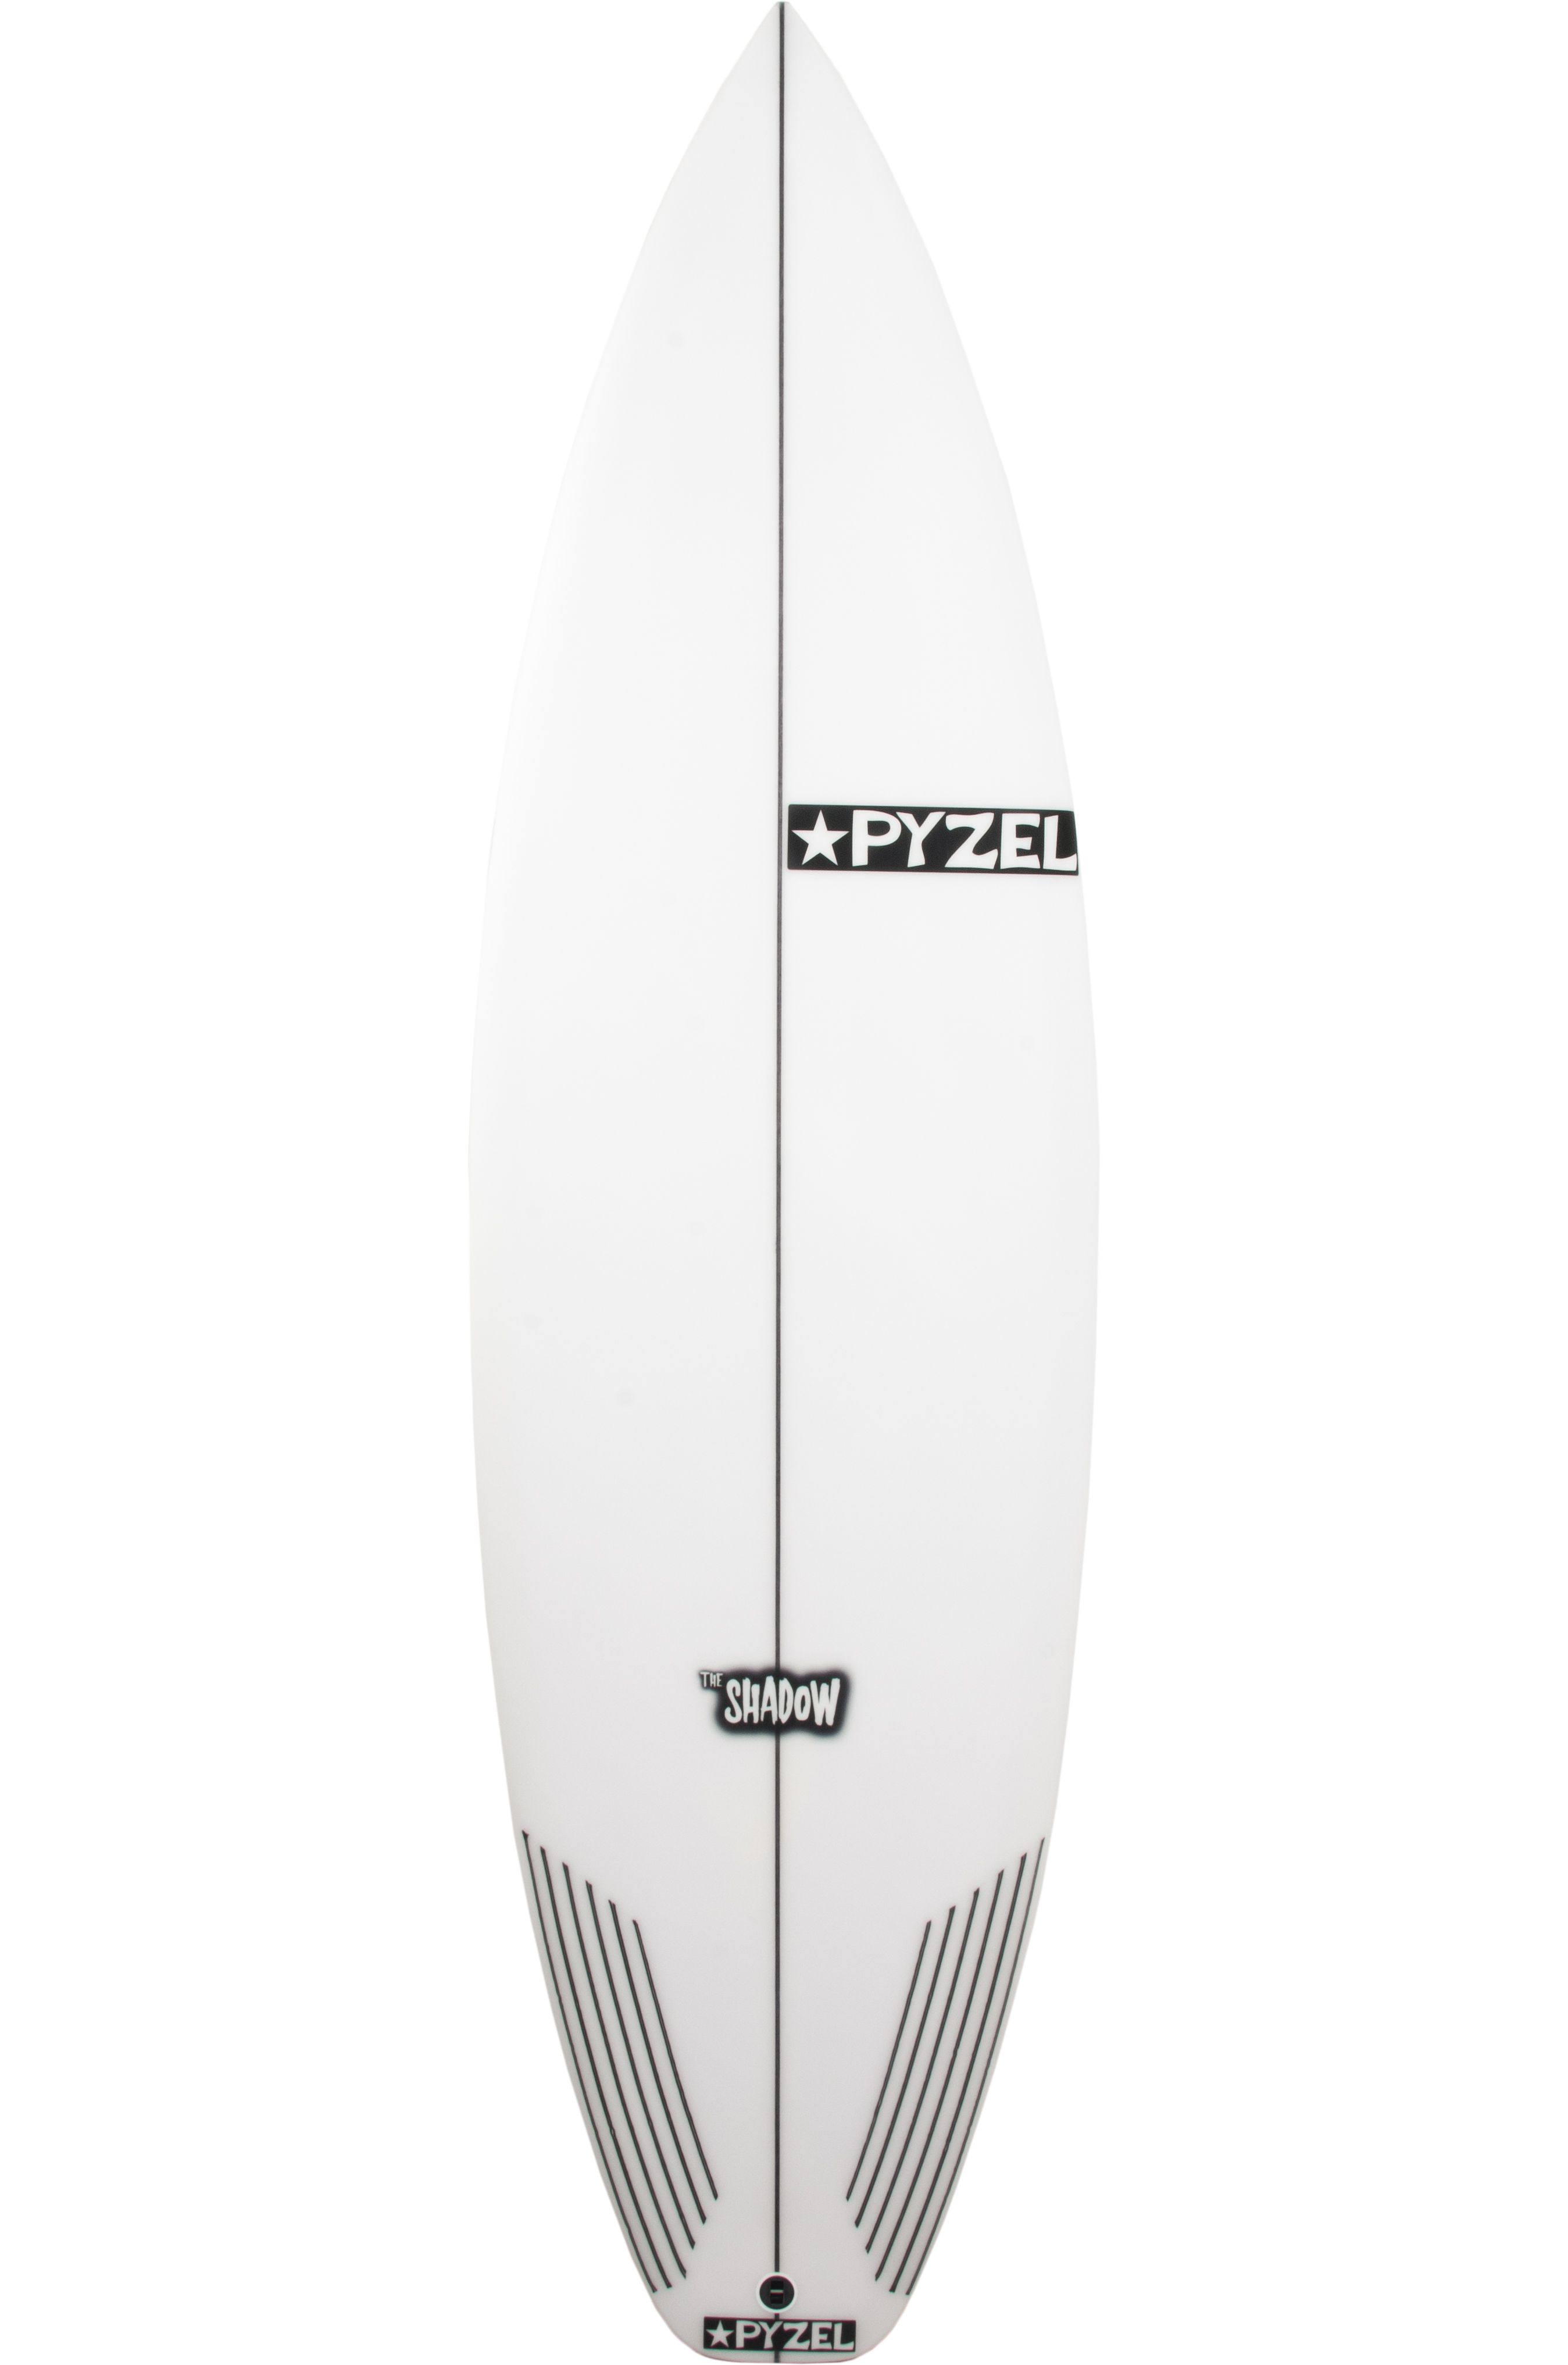 Prancha Surf Pyzel 5'9 SHADOW Squash Tail - White FCS II 5ft9